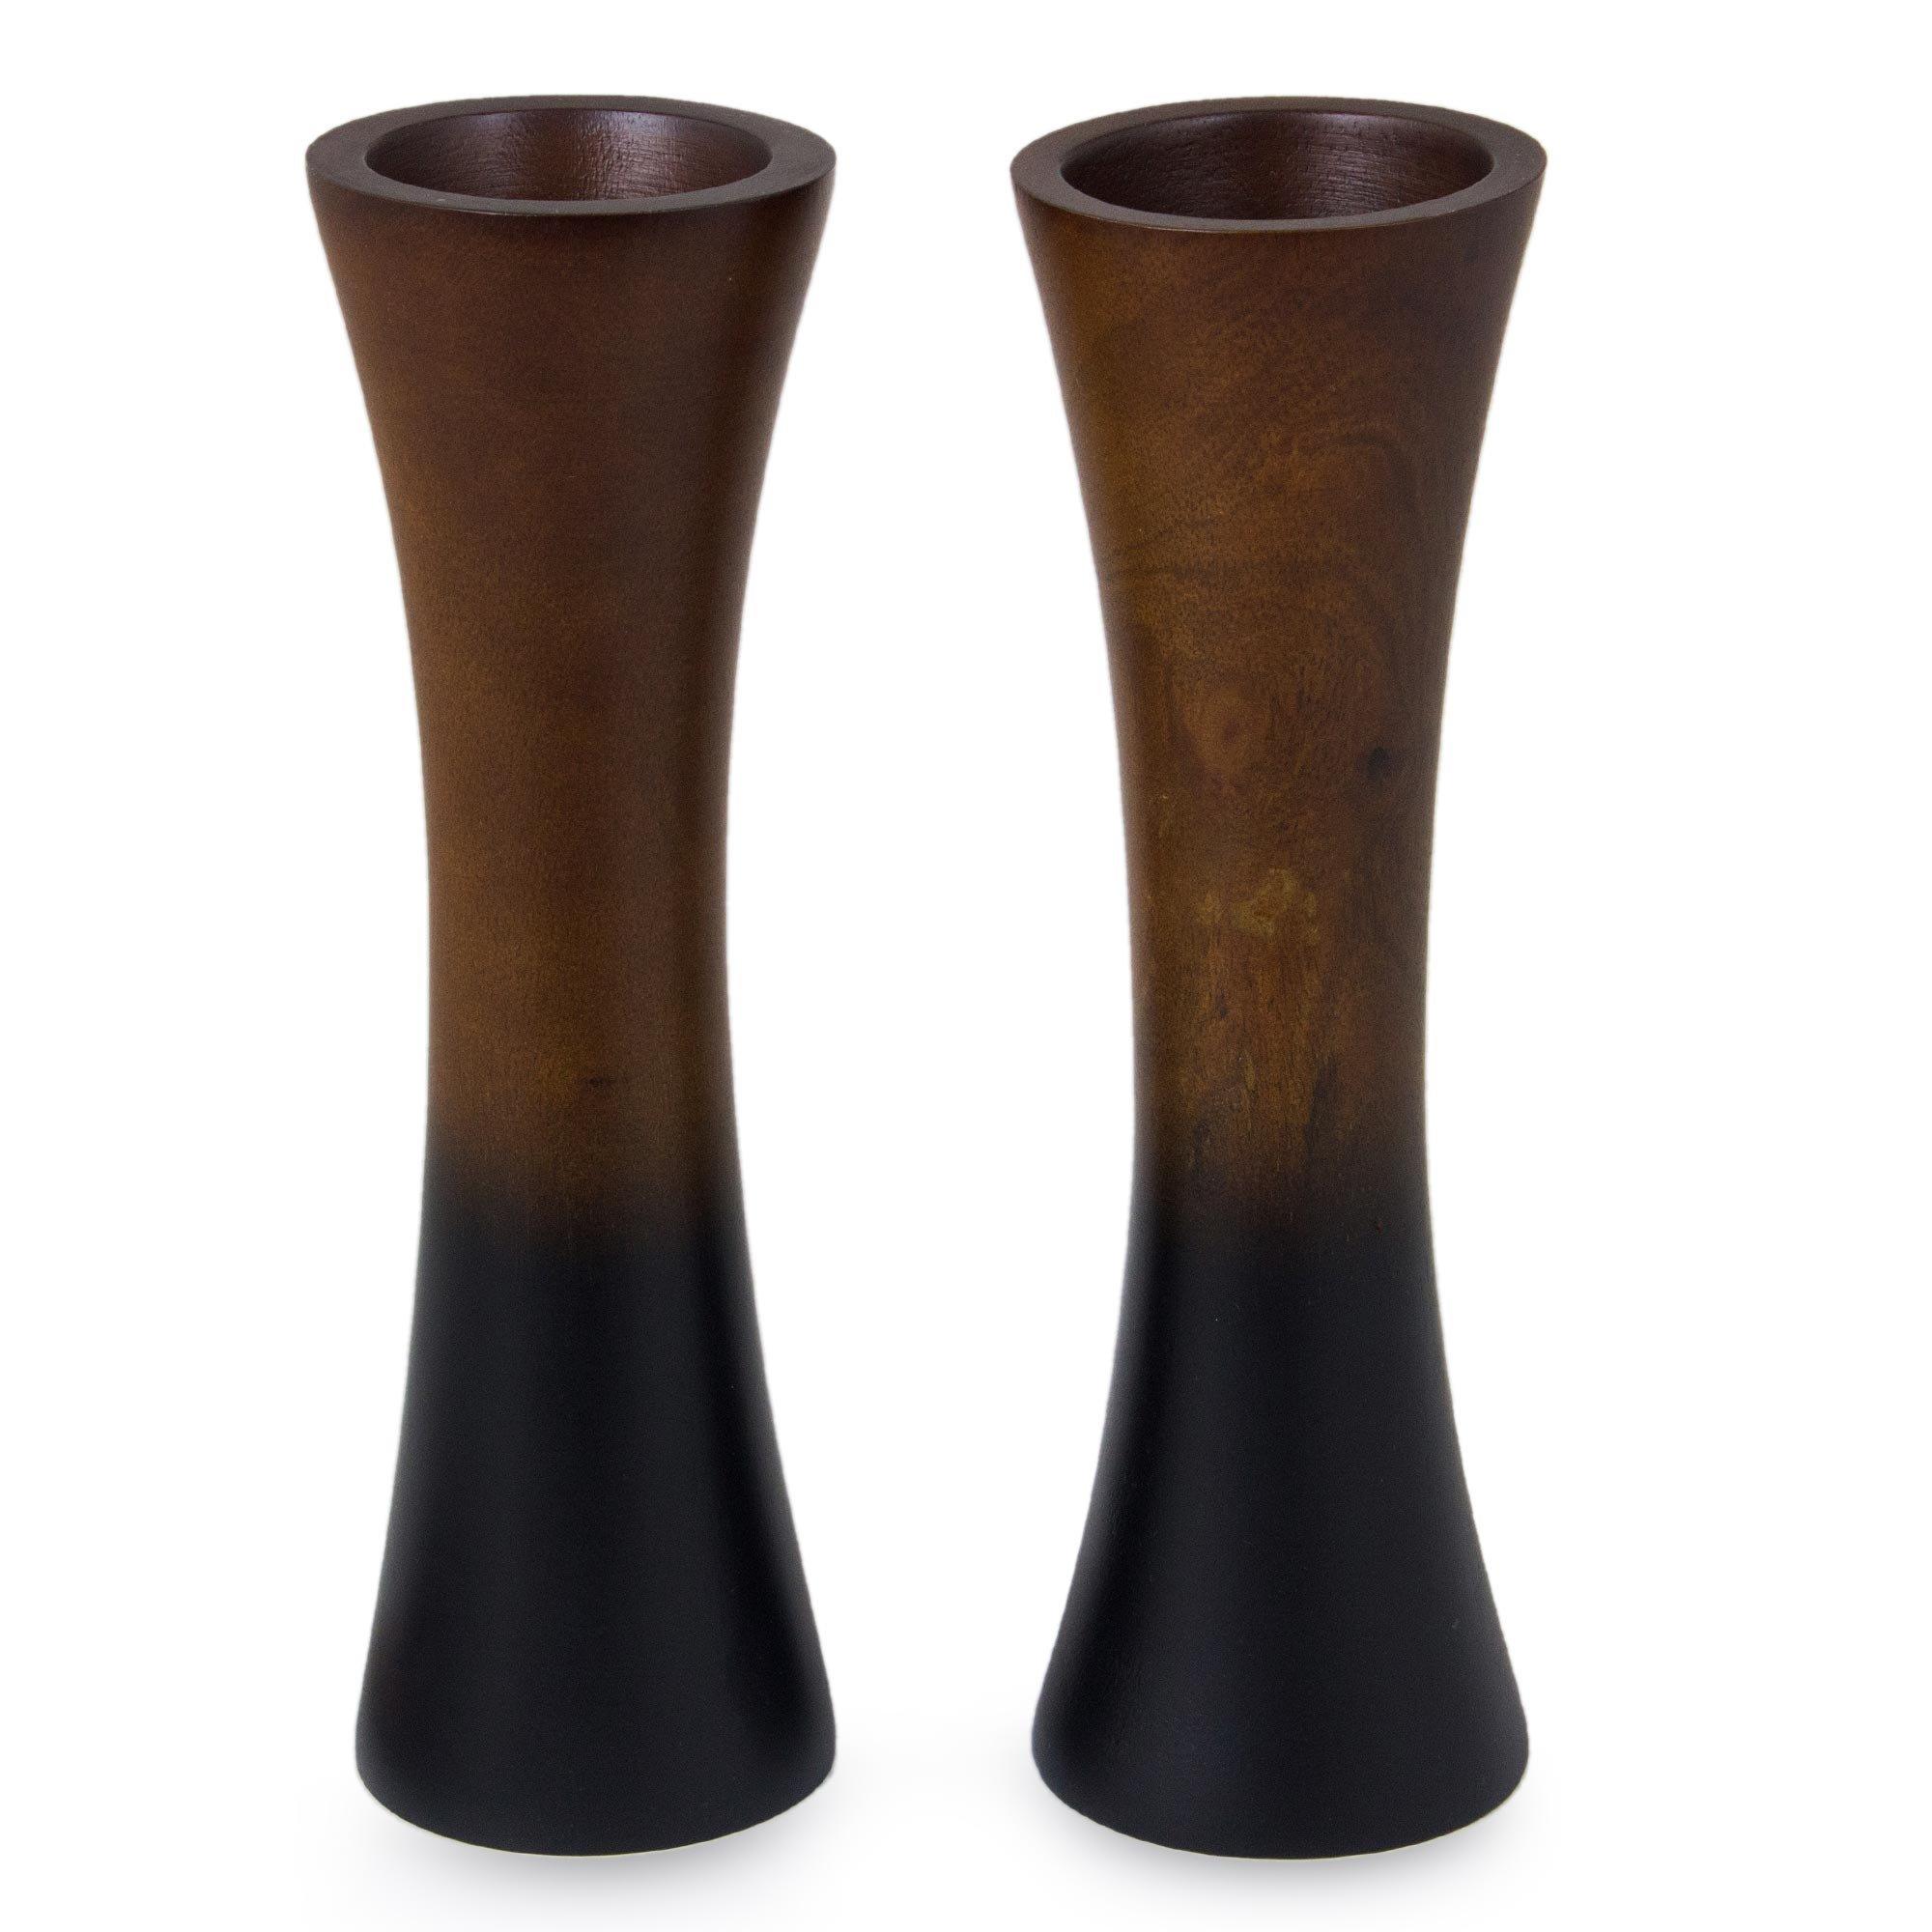 NOVICA ''Thai Trumpets 2 Piece Mango Wood Vases by NOVICA